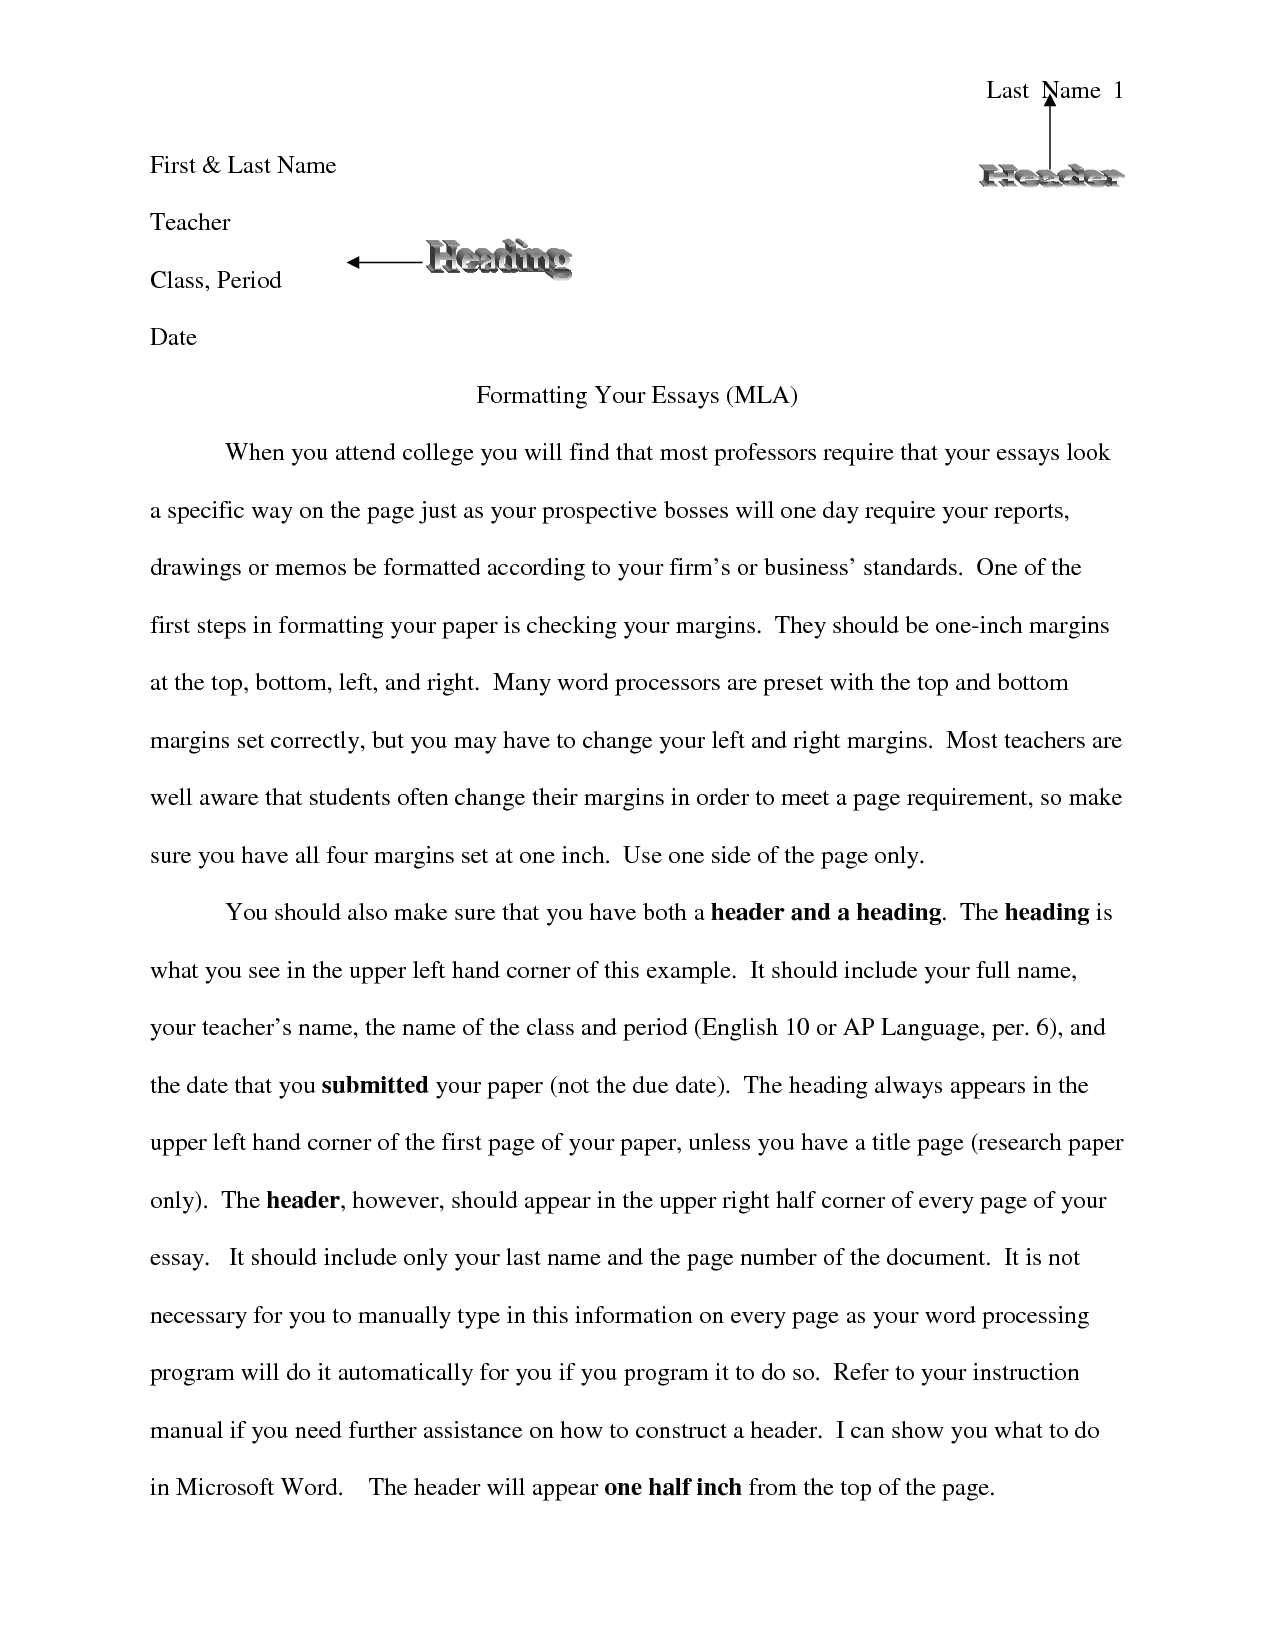 003 College Essay Format Template Nnftftofsn Stirring Application Admission Full